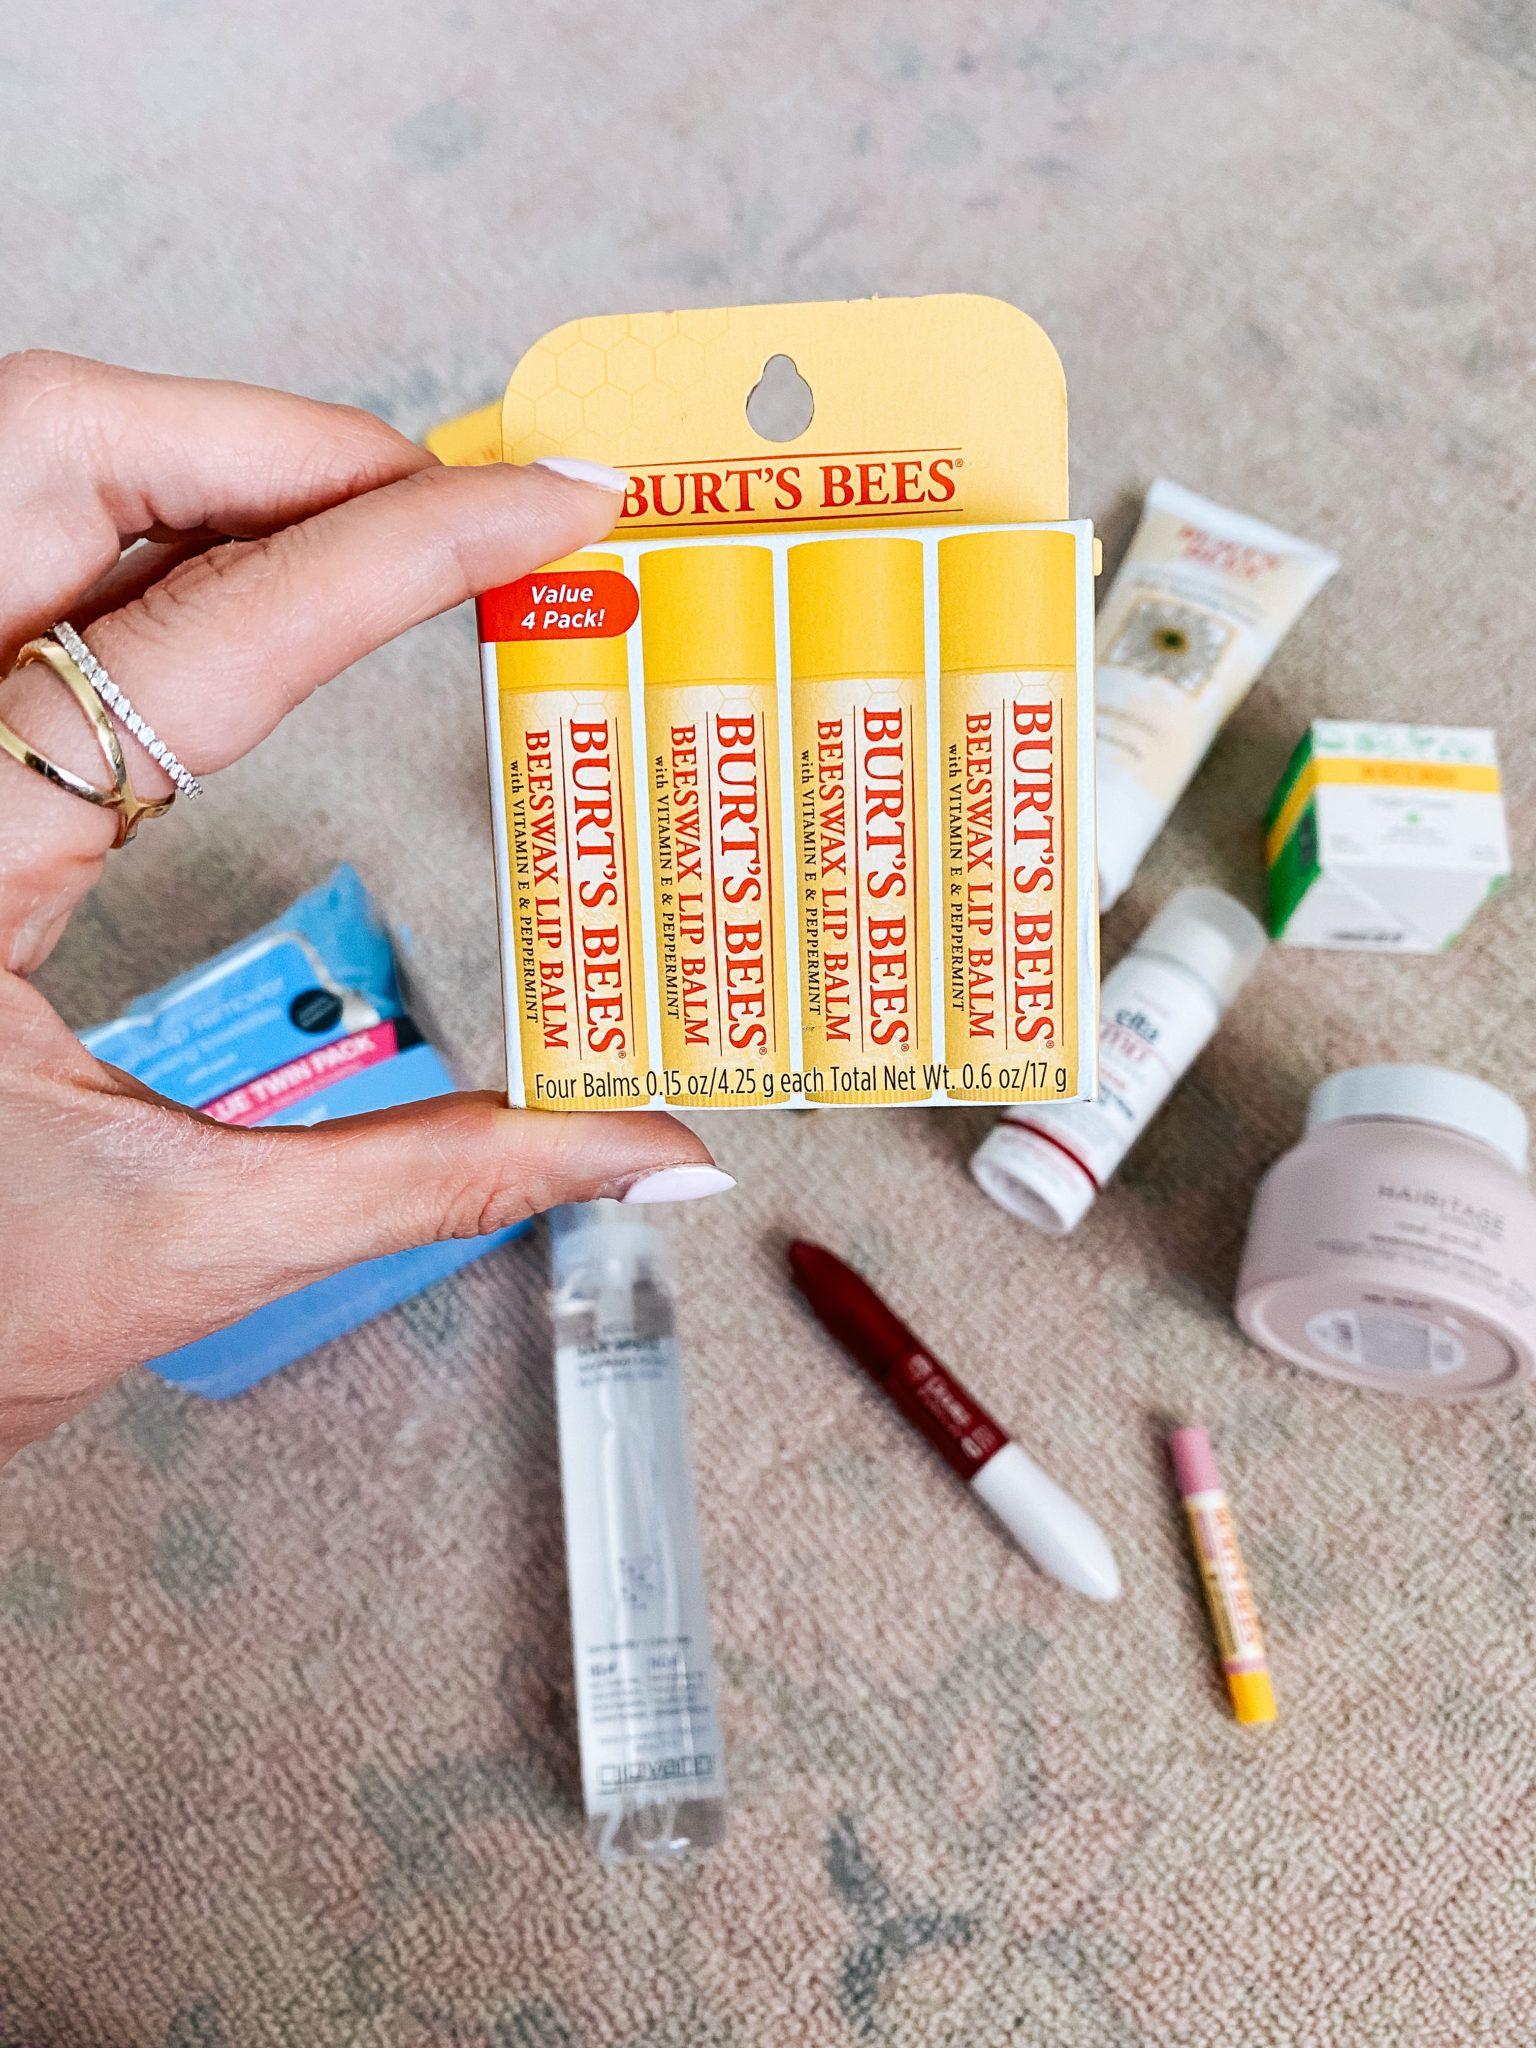 Walmart Beauty Products Beeswax lip balm, Beauty, The balm